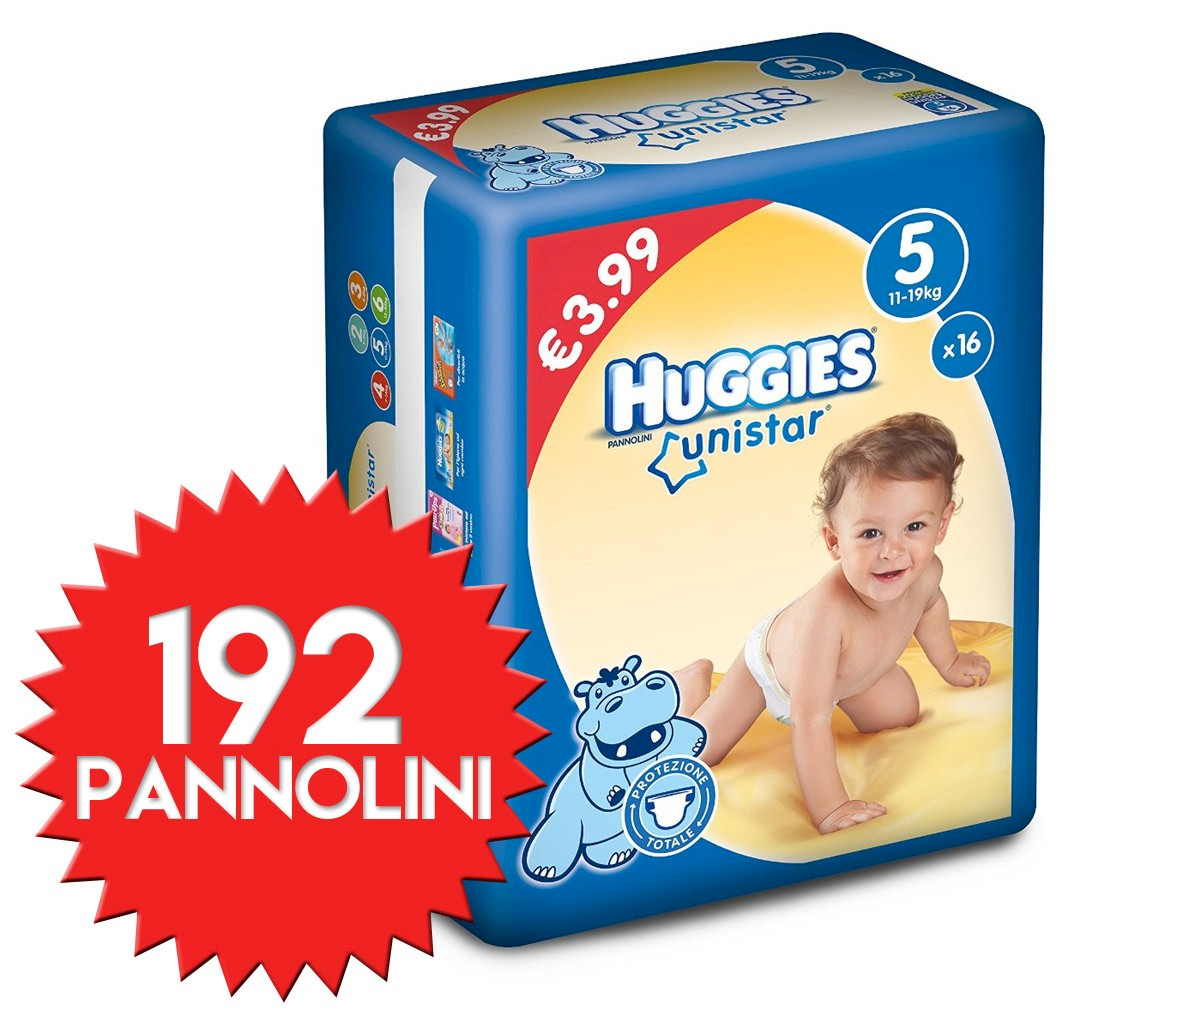 Pannolini Huggies Unistar Misura 5 - 192 pezzi